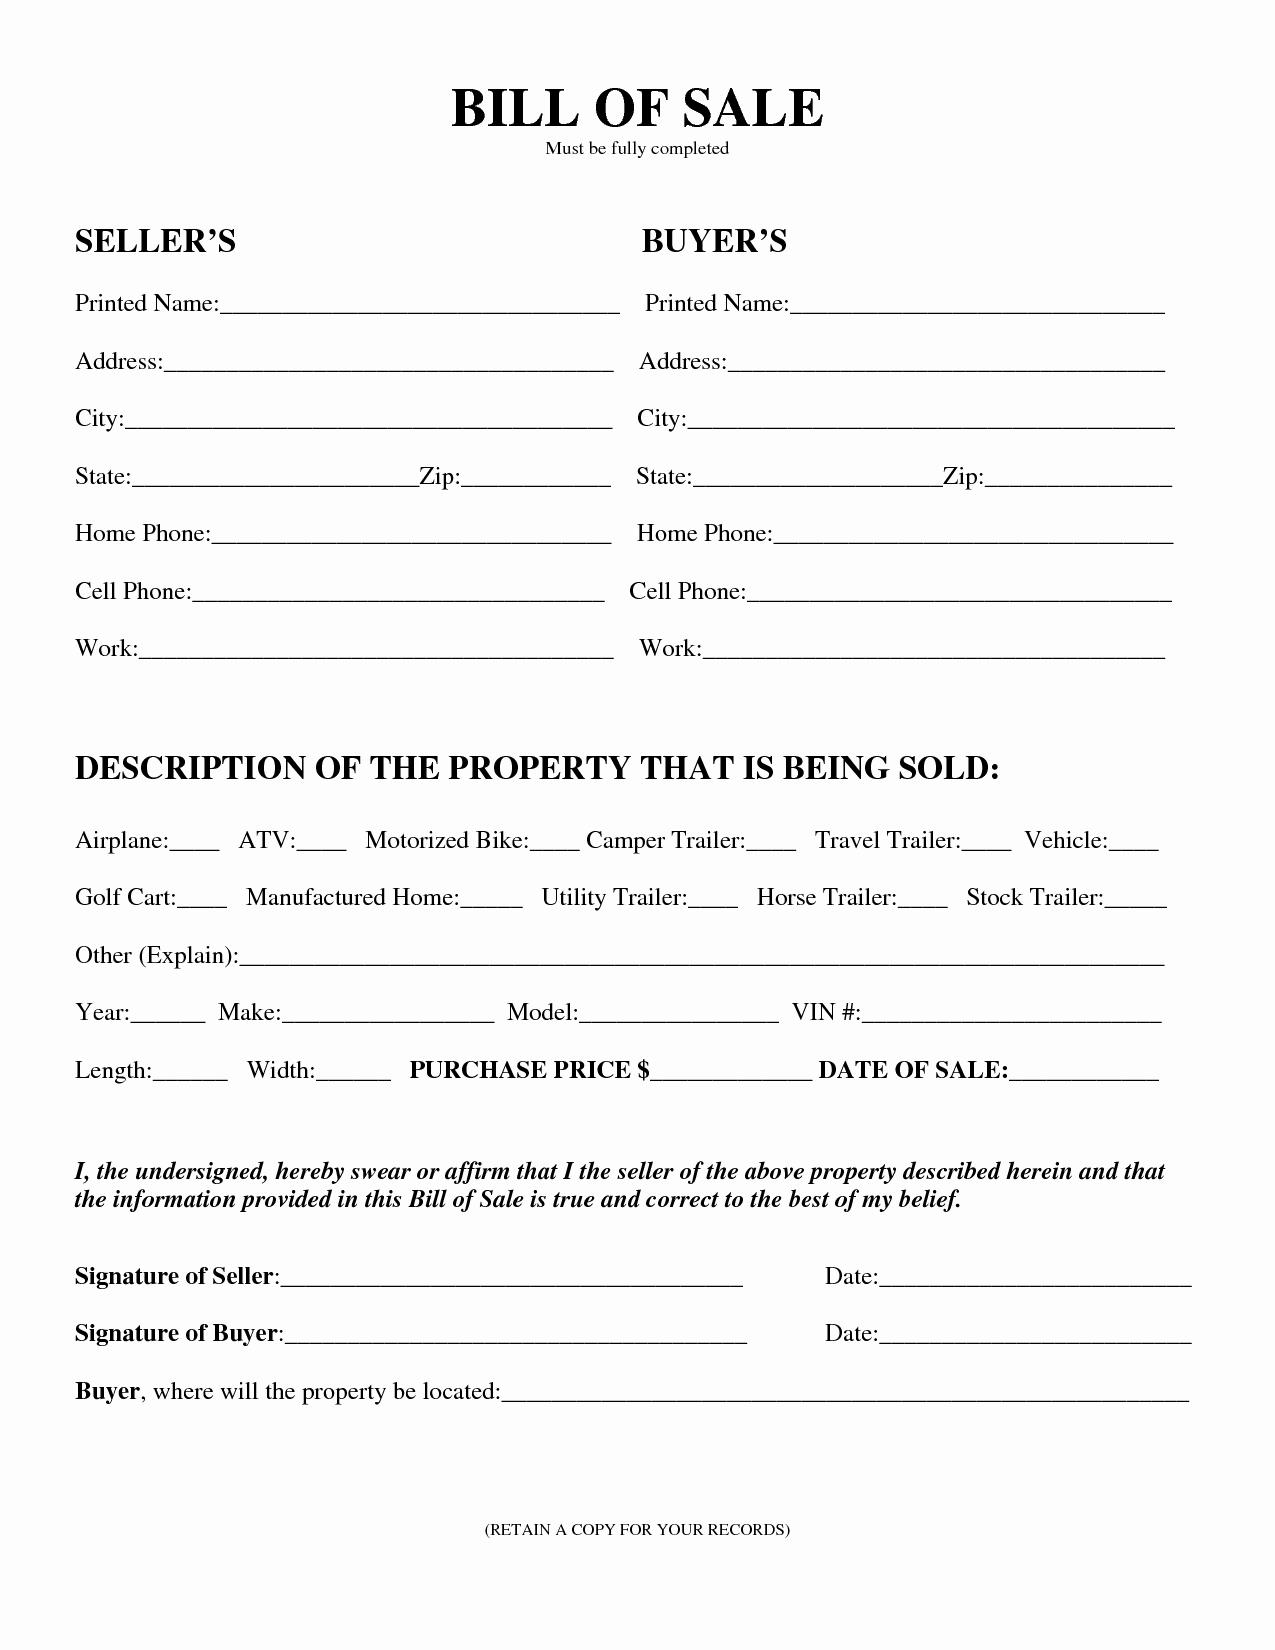 Texas Bill Of Sale Pdf Luxury Printable Sample Equipment Bill Sale Template form